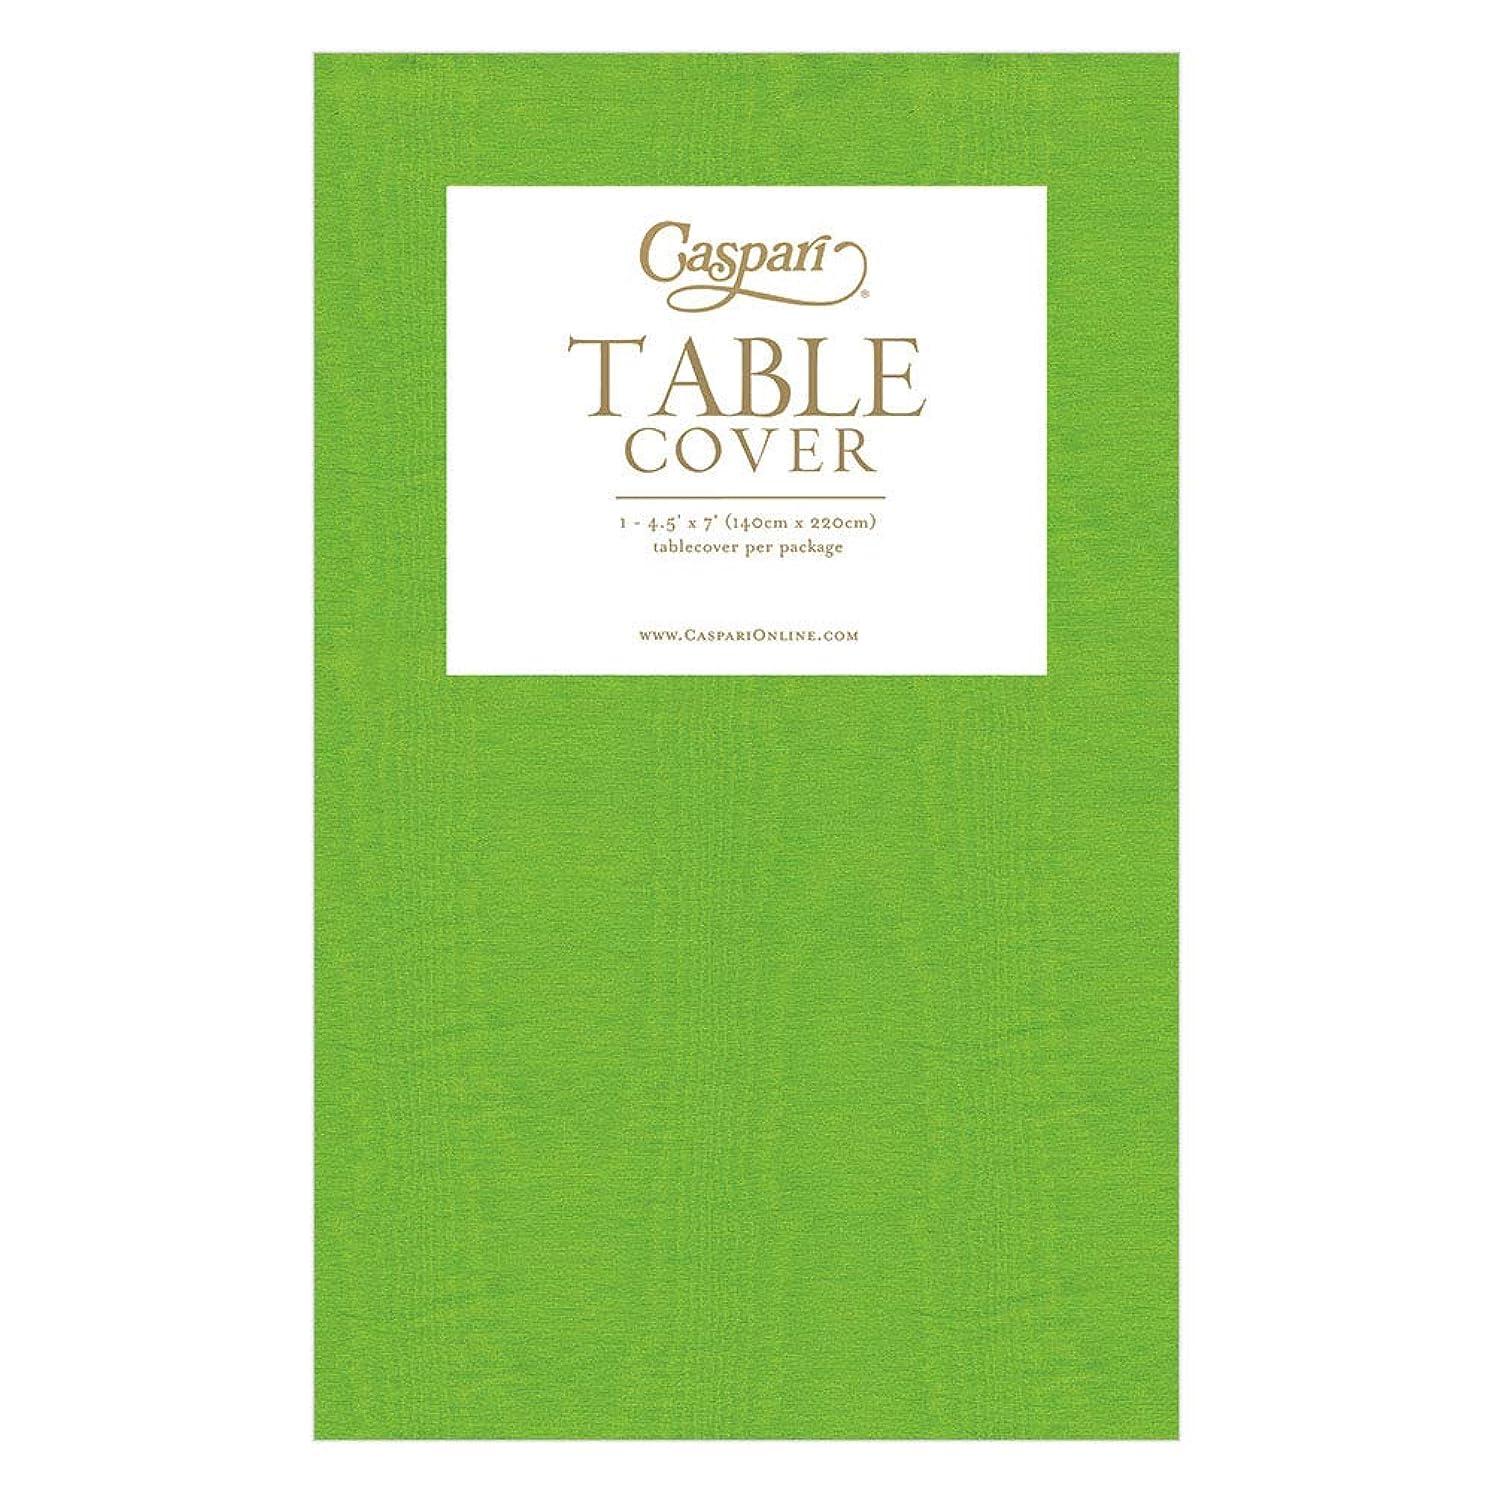 Caspari 9734TCP Moss Green Moire Printed Paper Table Cover, 7' x 4.5',